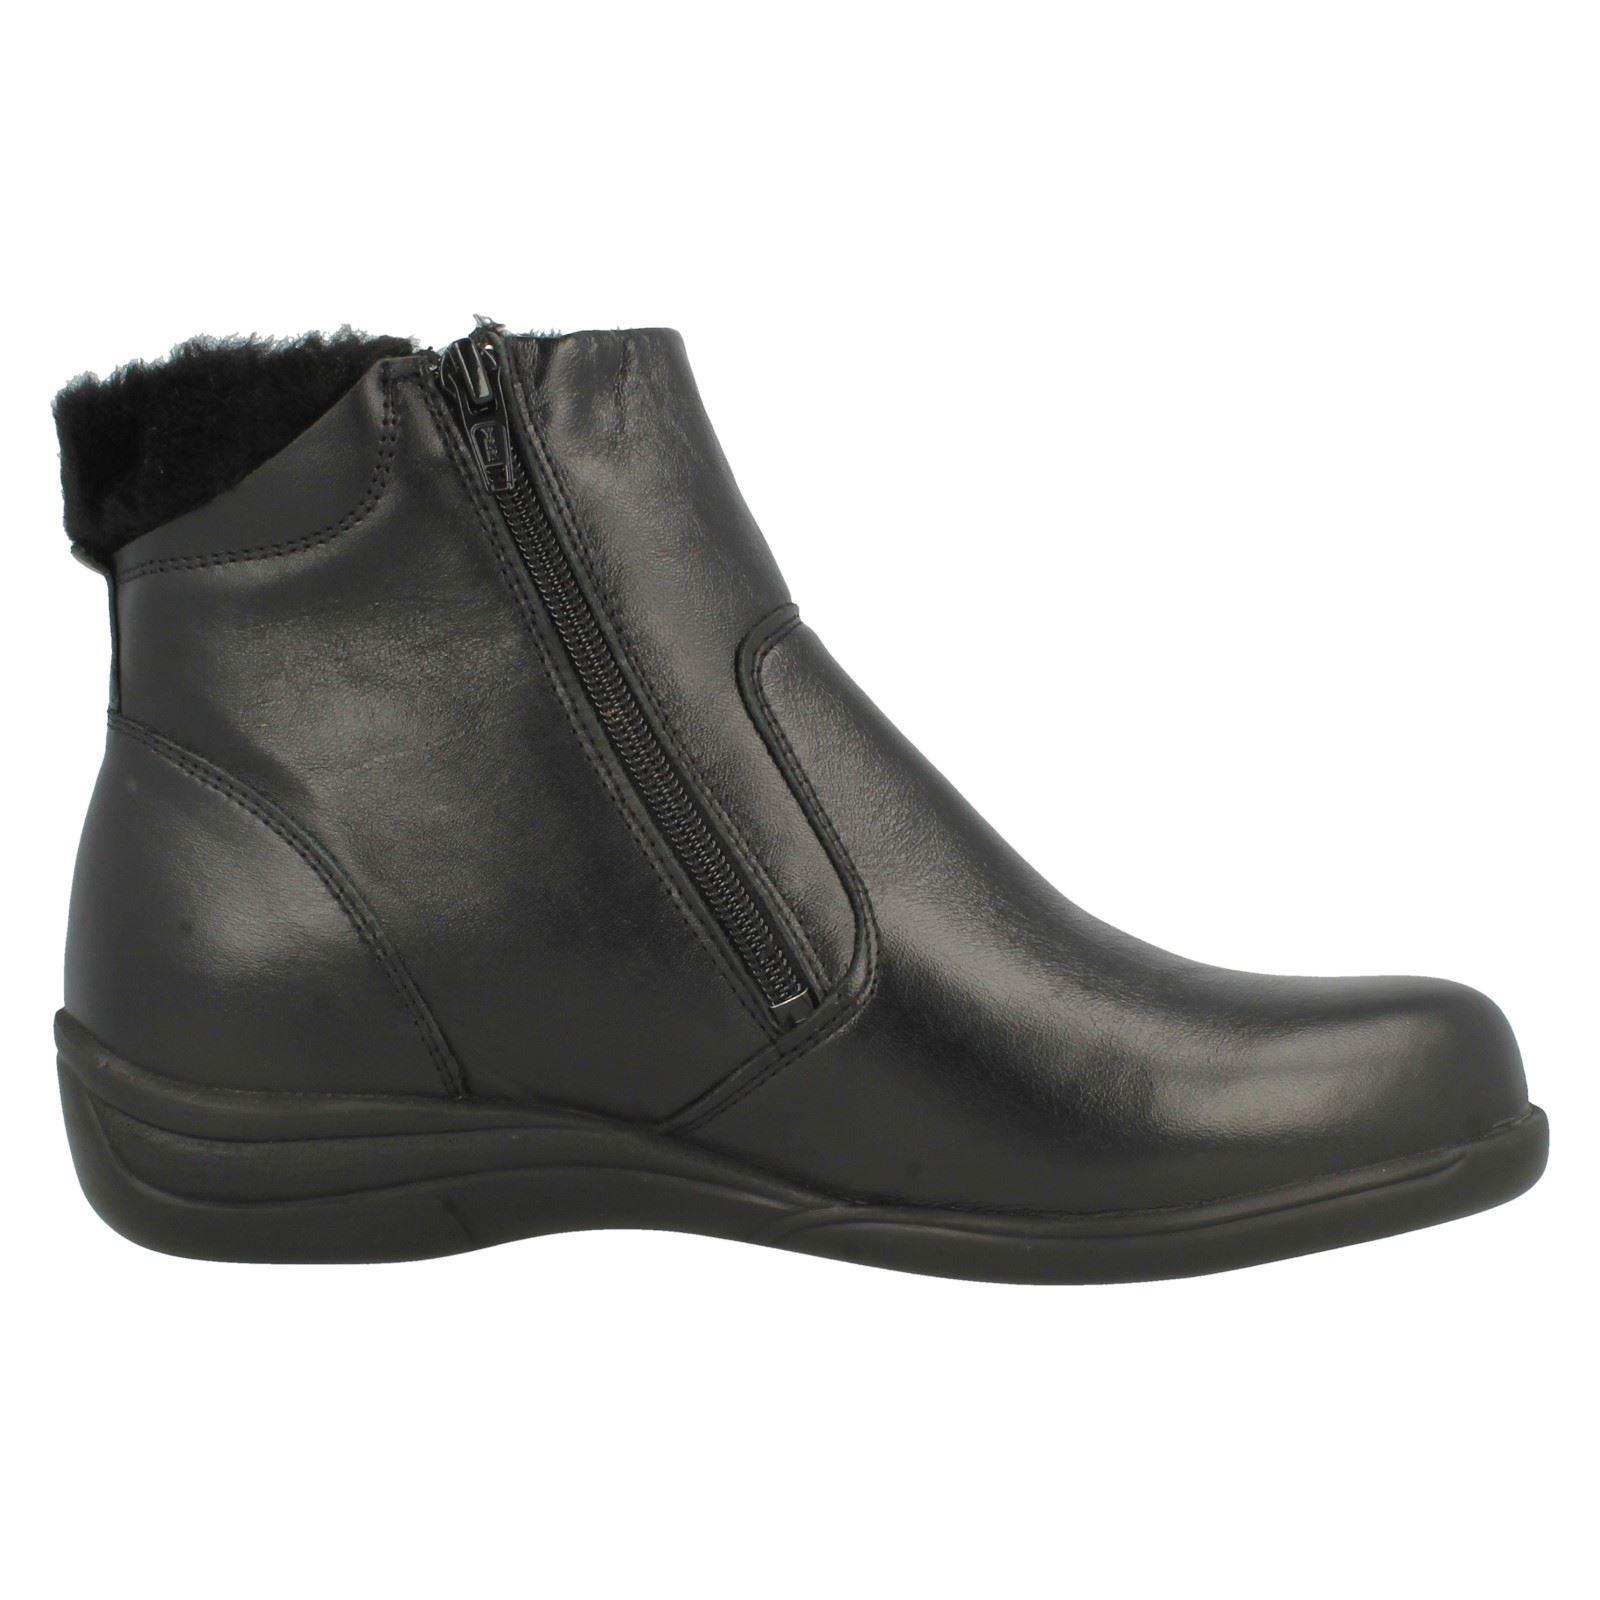 Damas Padders Tobillo botas botas botas Shona ff38c7